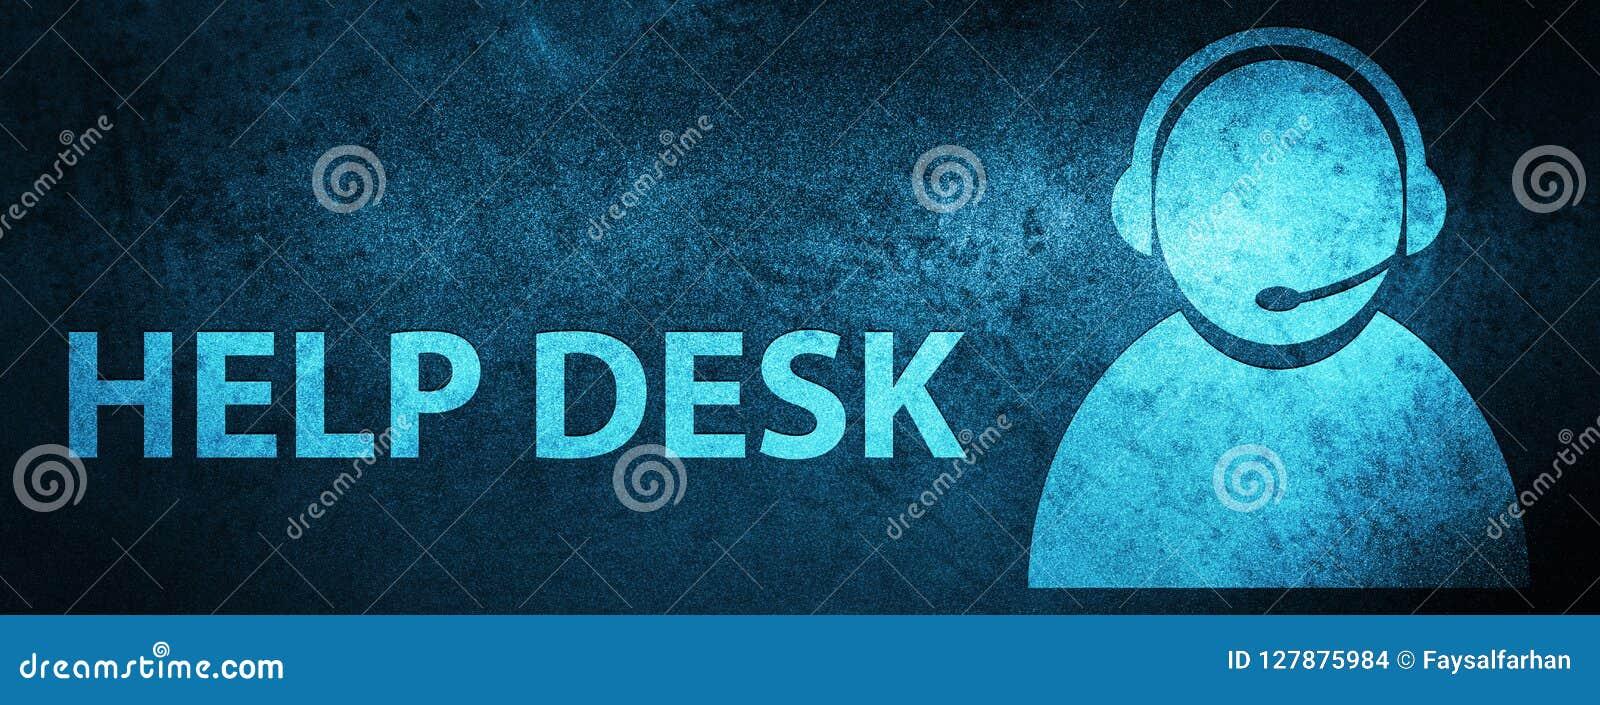 Help Desk Customer Care Icon Special Blue Banner Background Stock Illustration Illustration Of Help Care 127875984